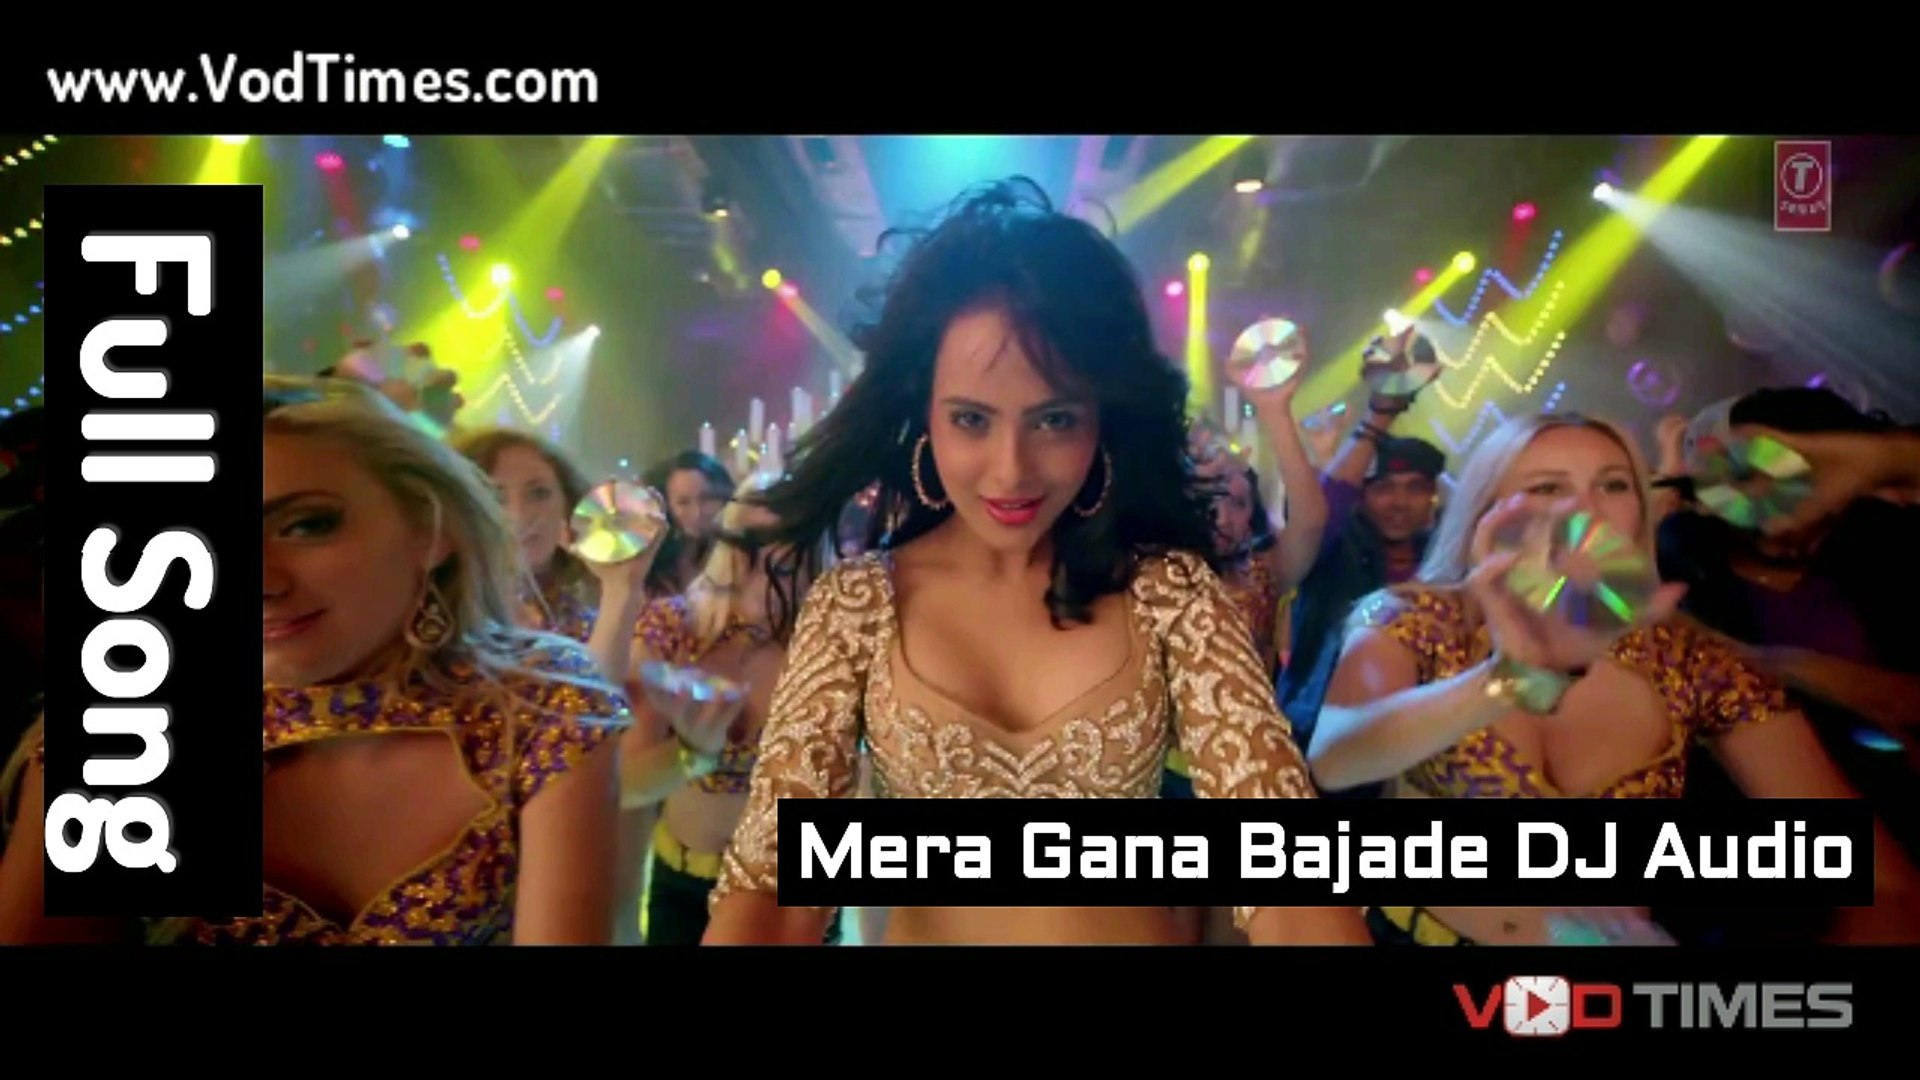 DJ Mera Gana Baja De - Full Song (Audio) | Hey Bro Movie - video dailymotion